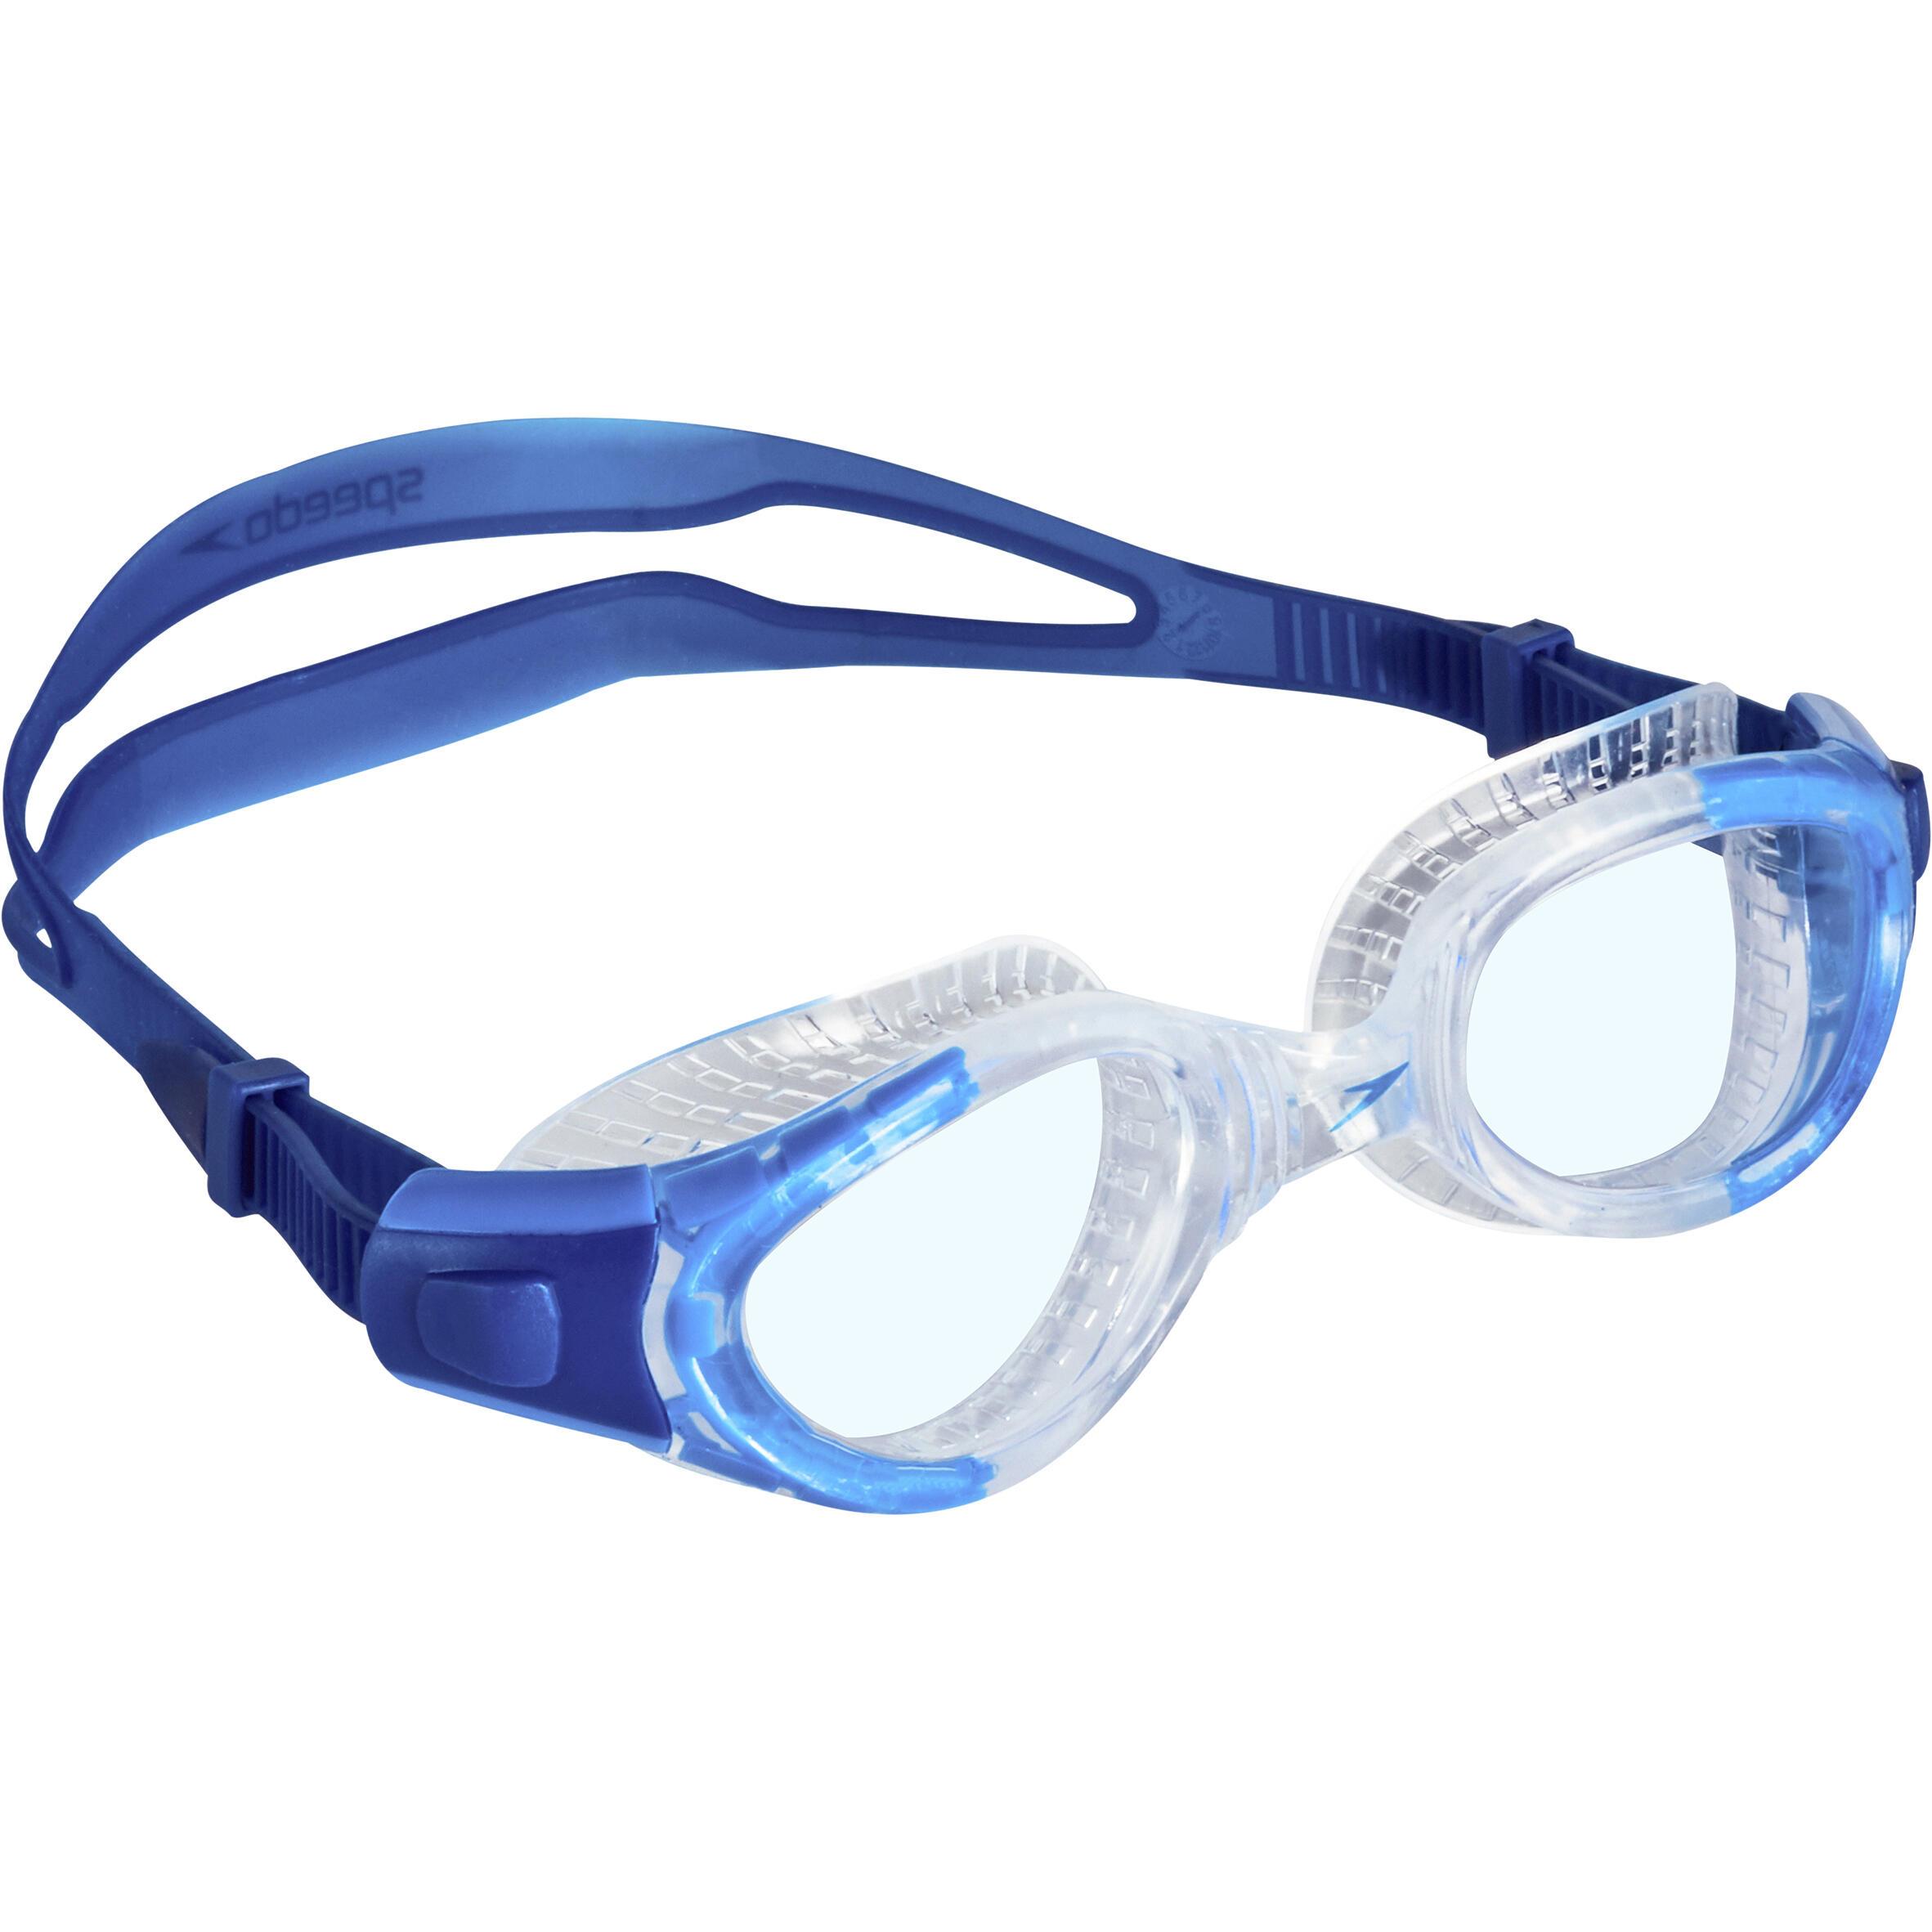 Lunettes de natation Speedo Futura Biofuse